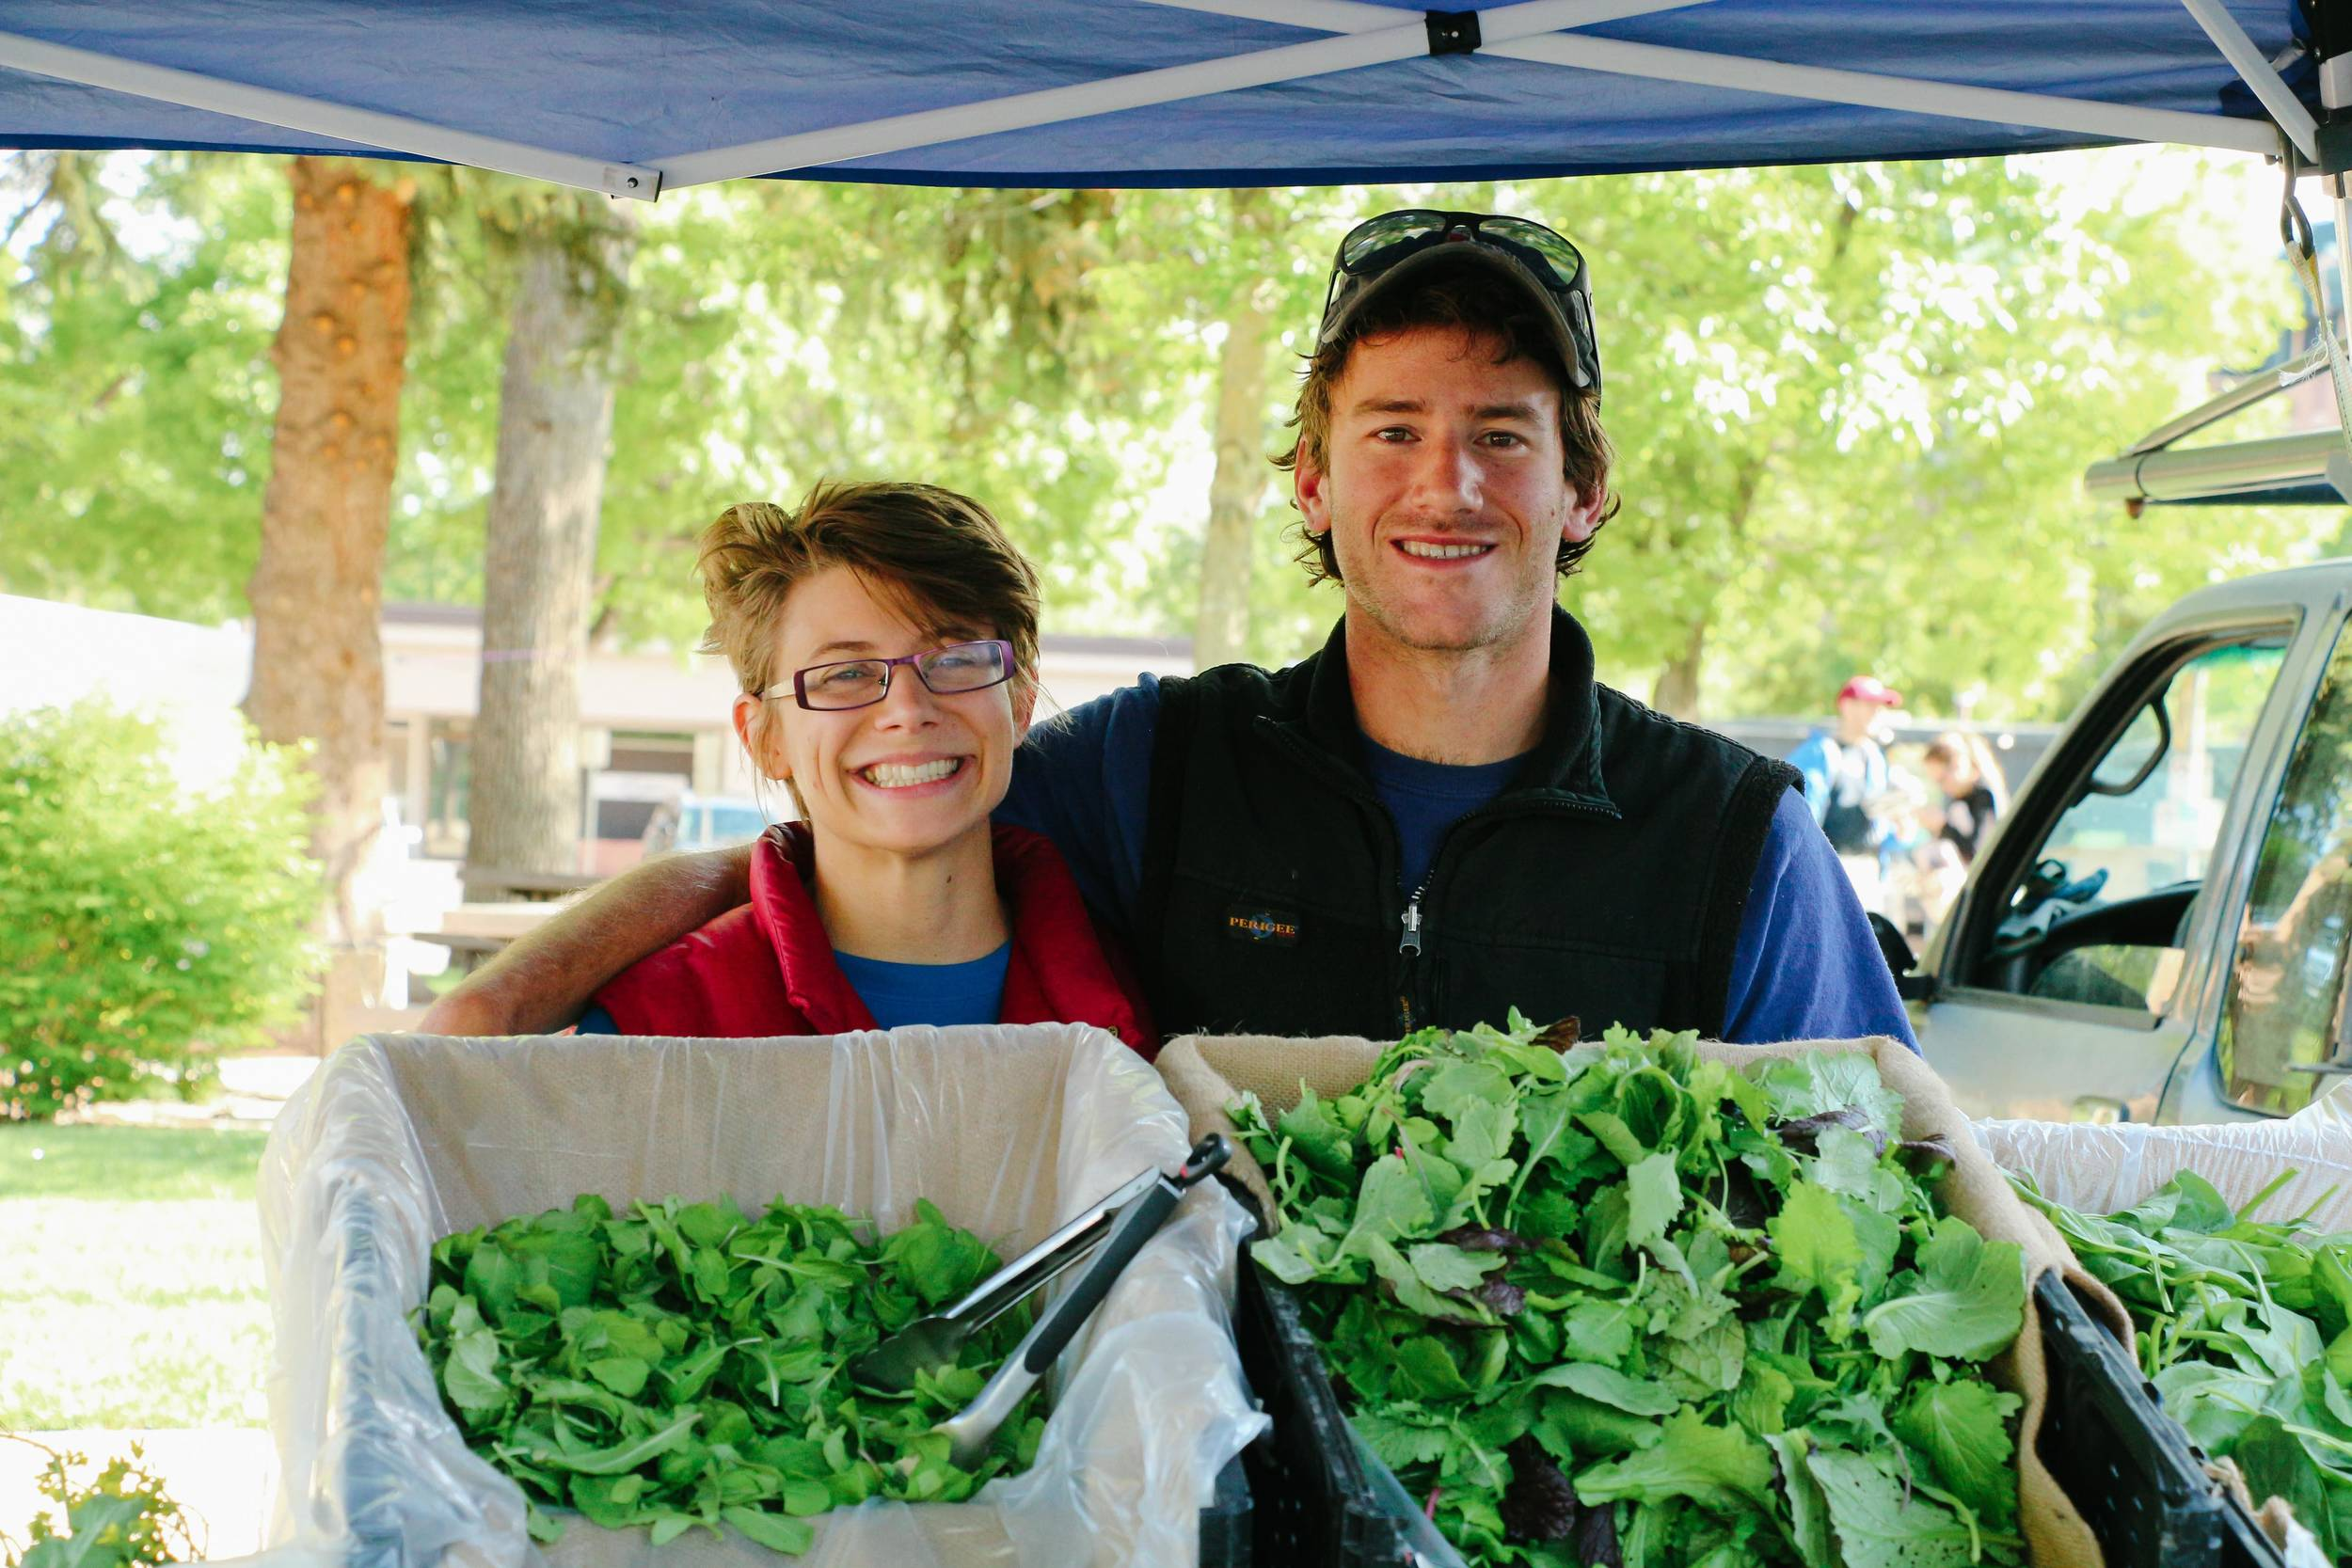 Ben and Natalie from Raisin Roots Farm at the Larimer County Farmer's Market